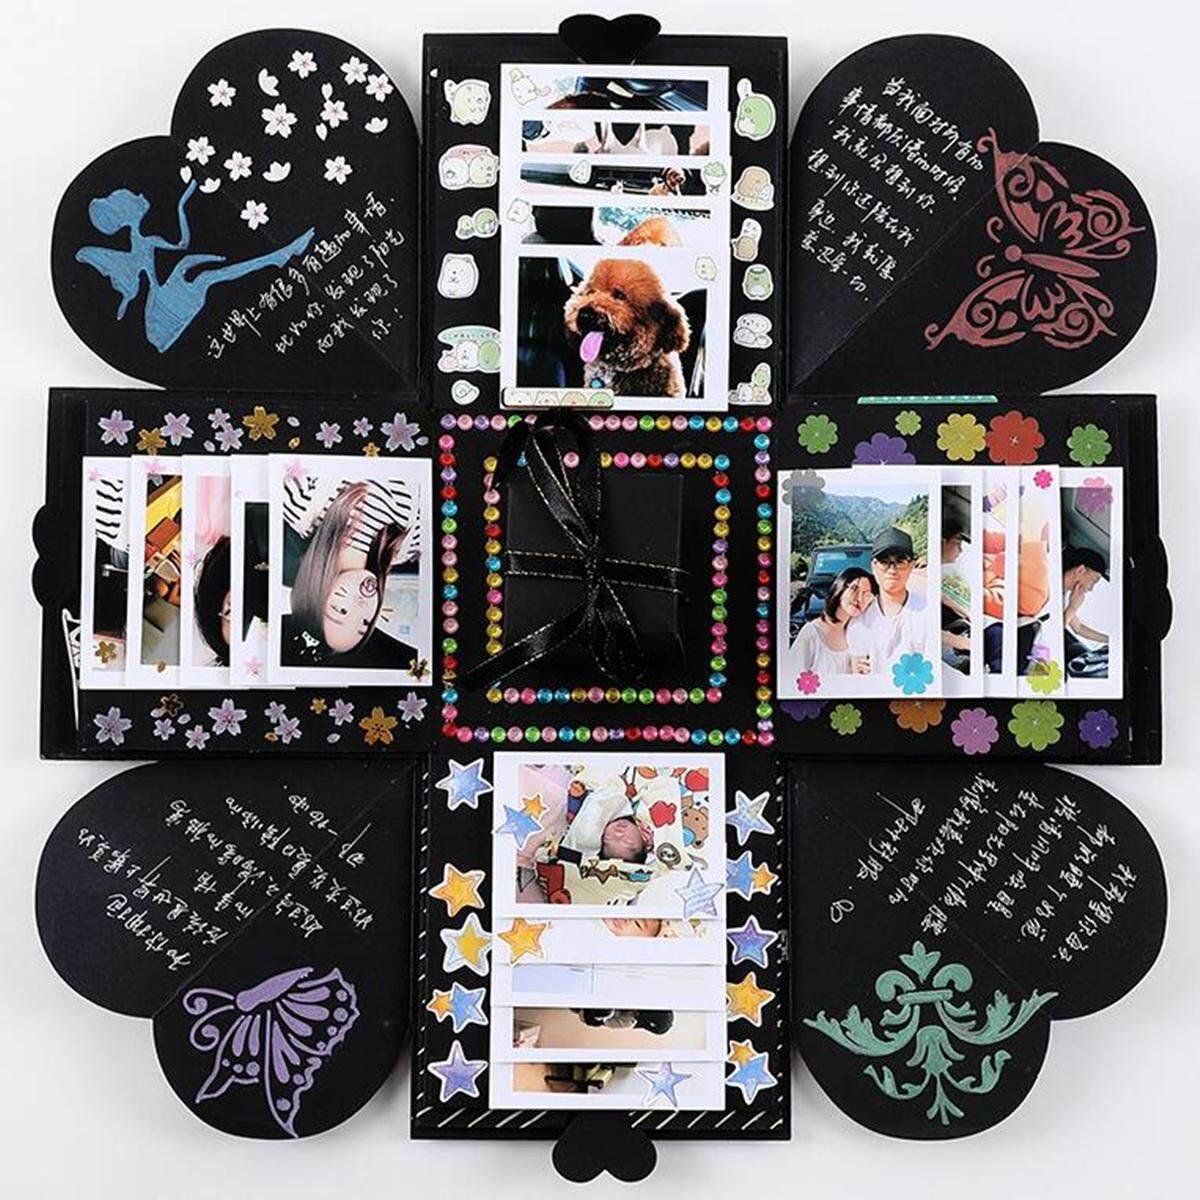 Review Diy Explosion Box Memory Scrapbook Photo Album Craft Kits Anniversary Gift Party Intl China